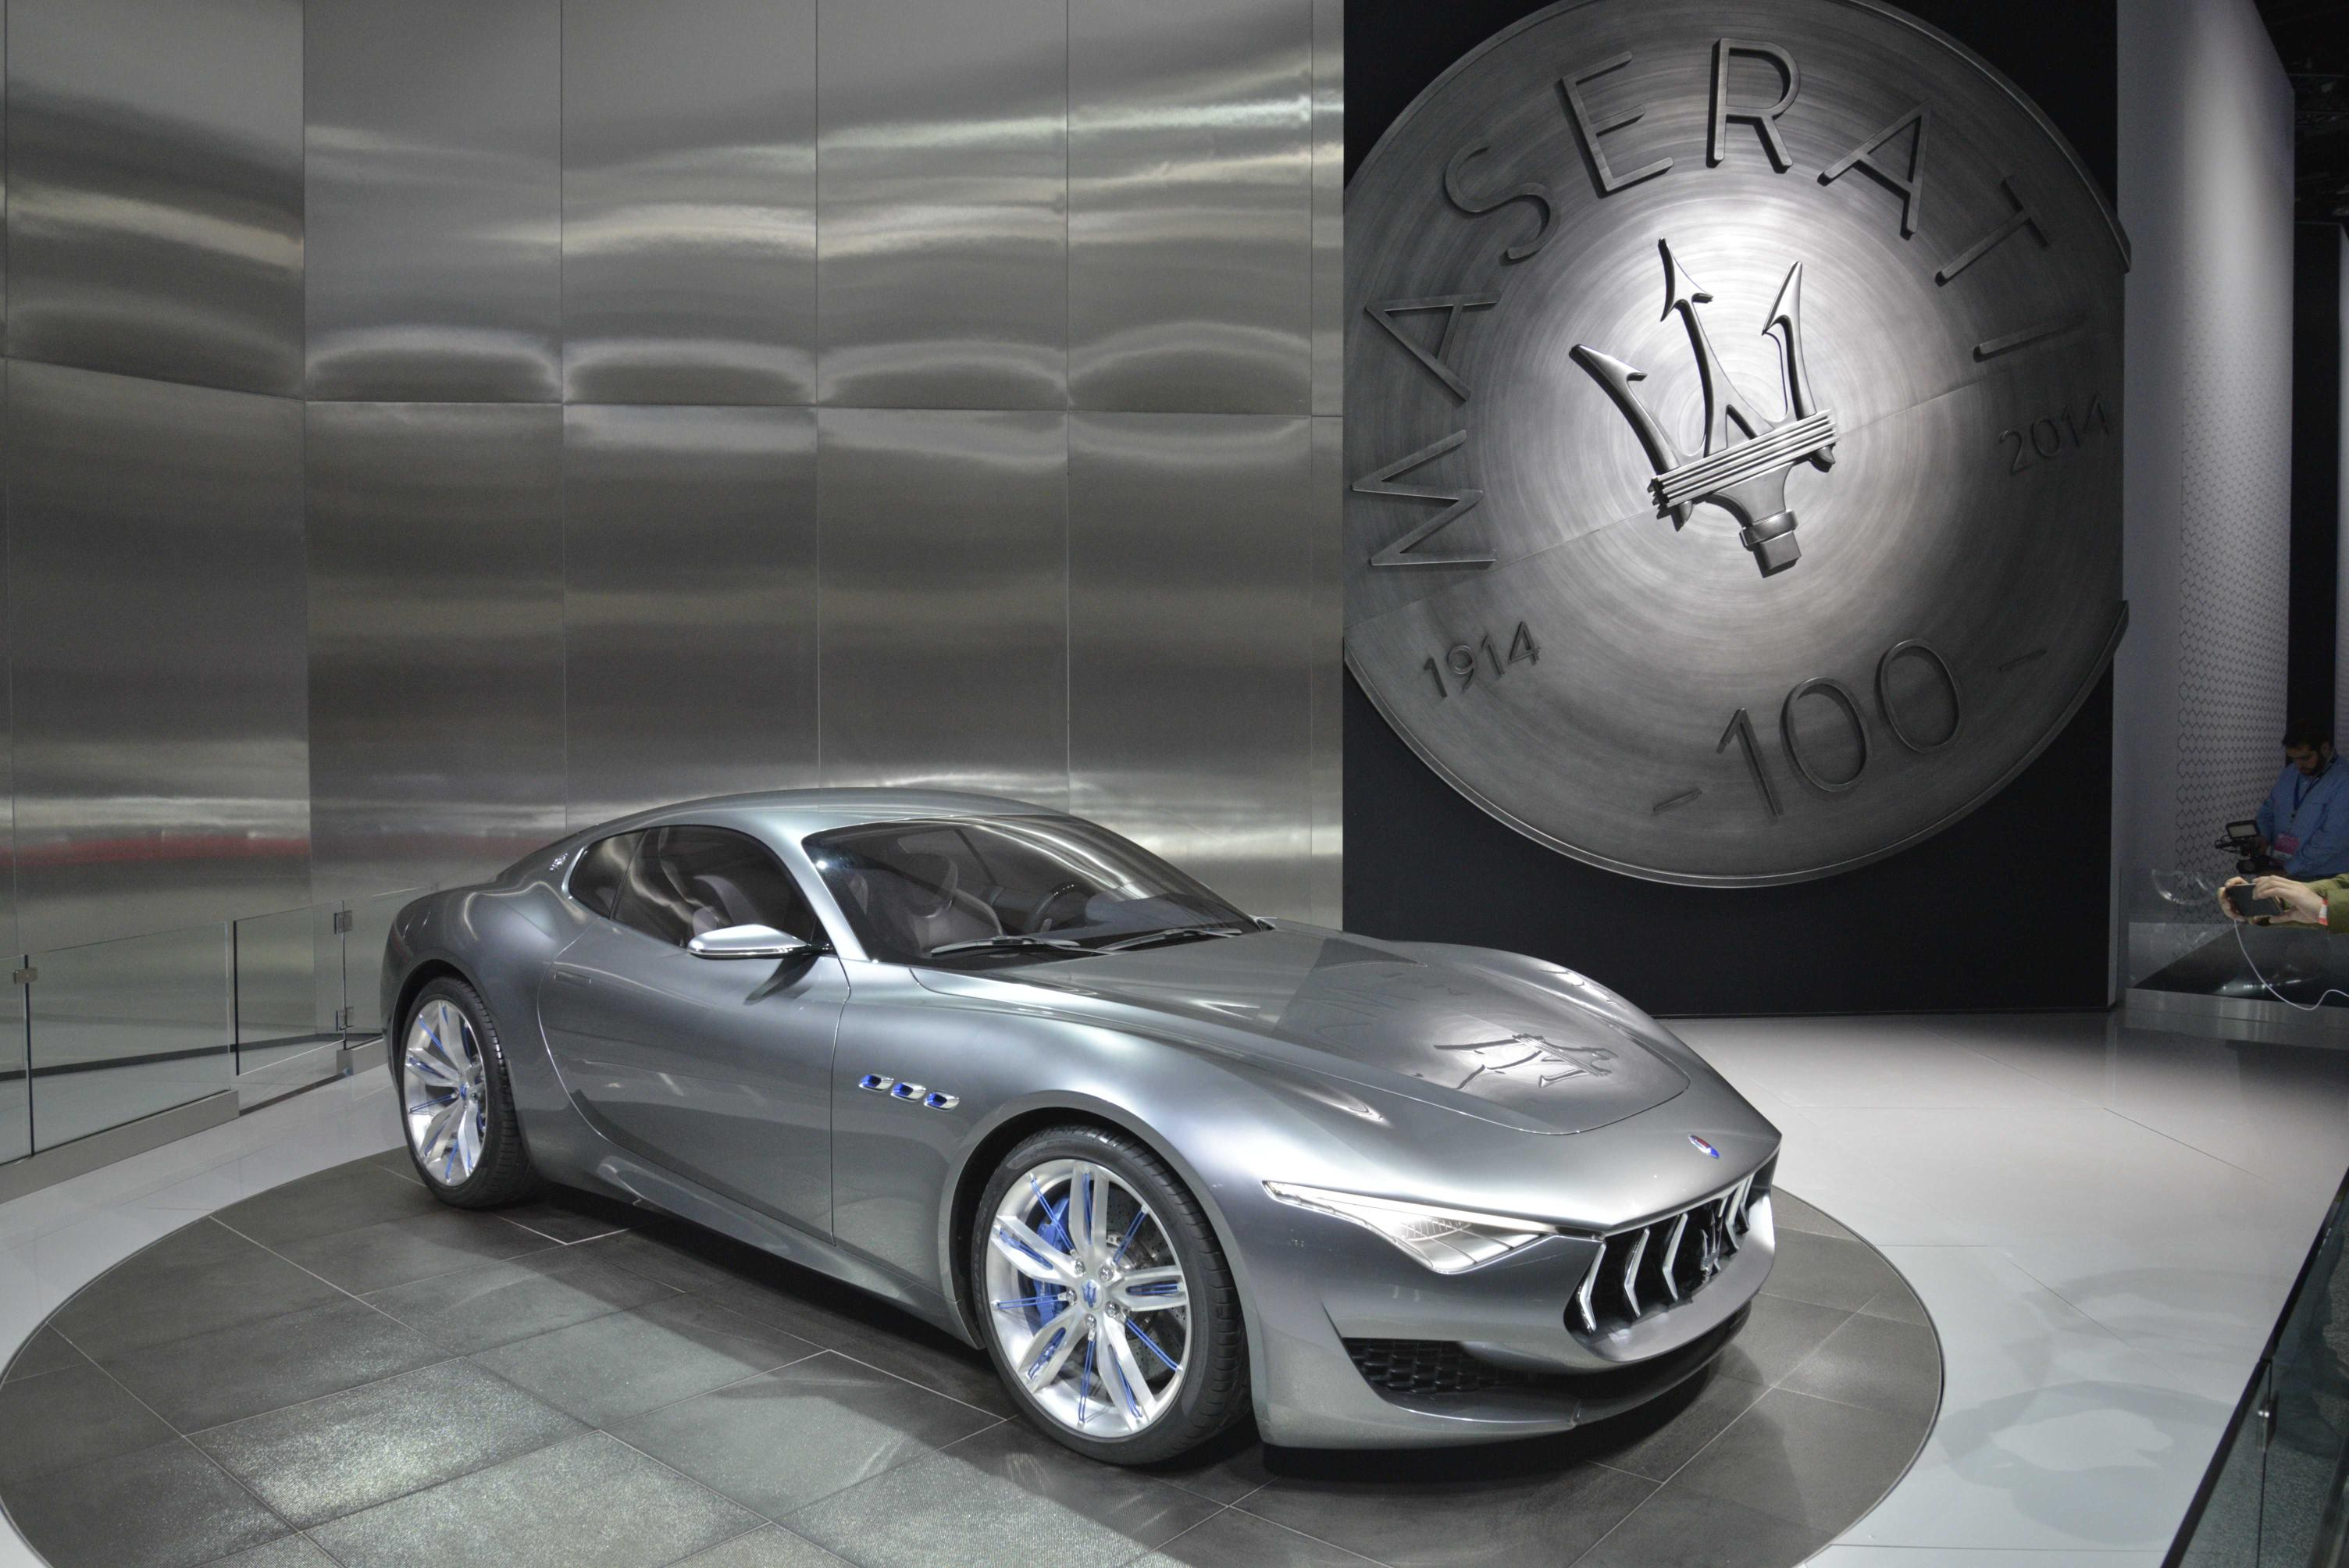 Maserati To Debut Granturismo Replacement In 2017 Alfieri In 2018